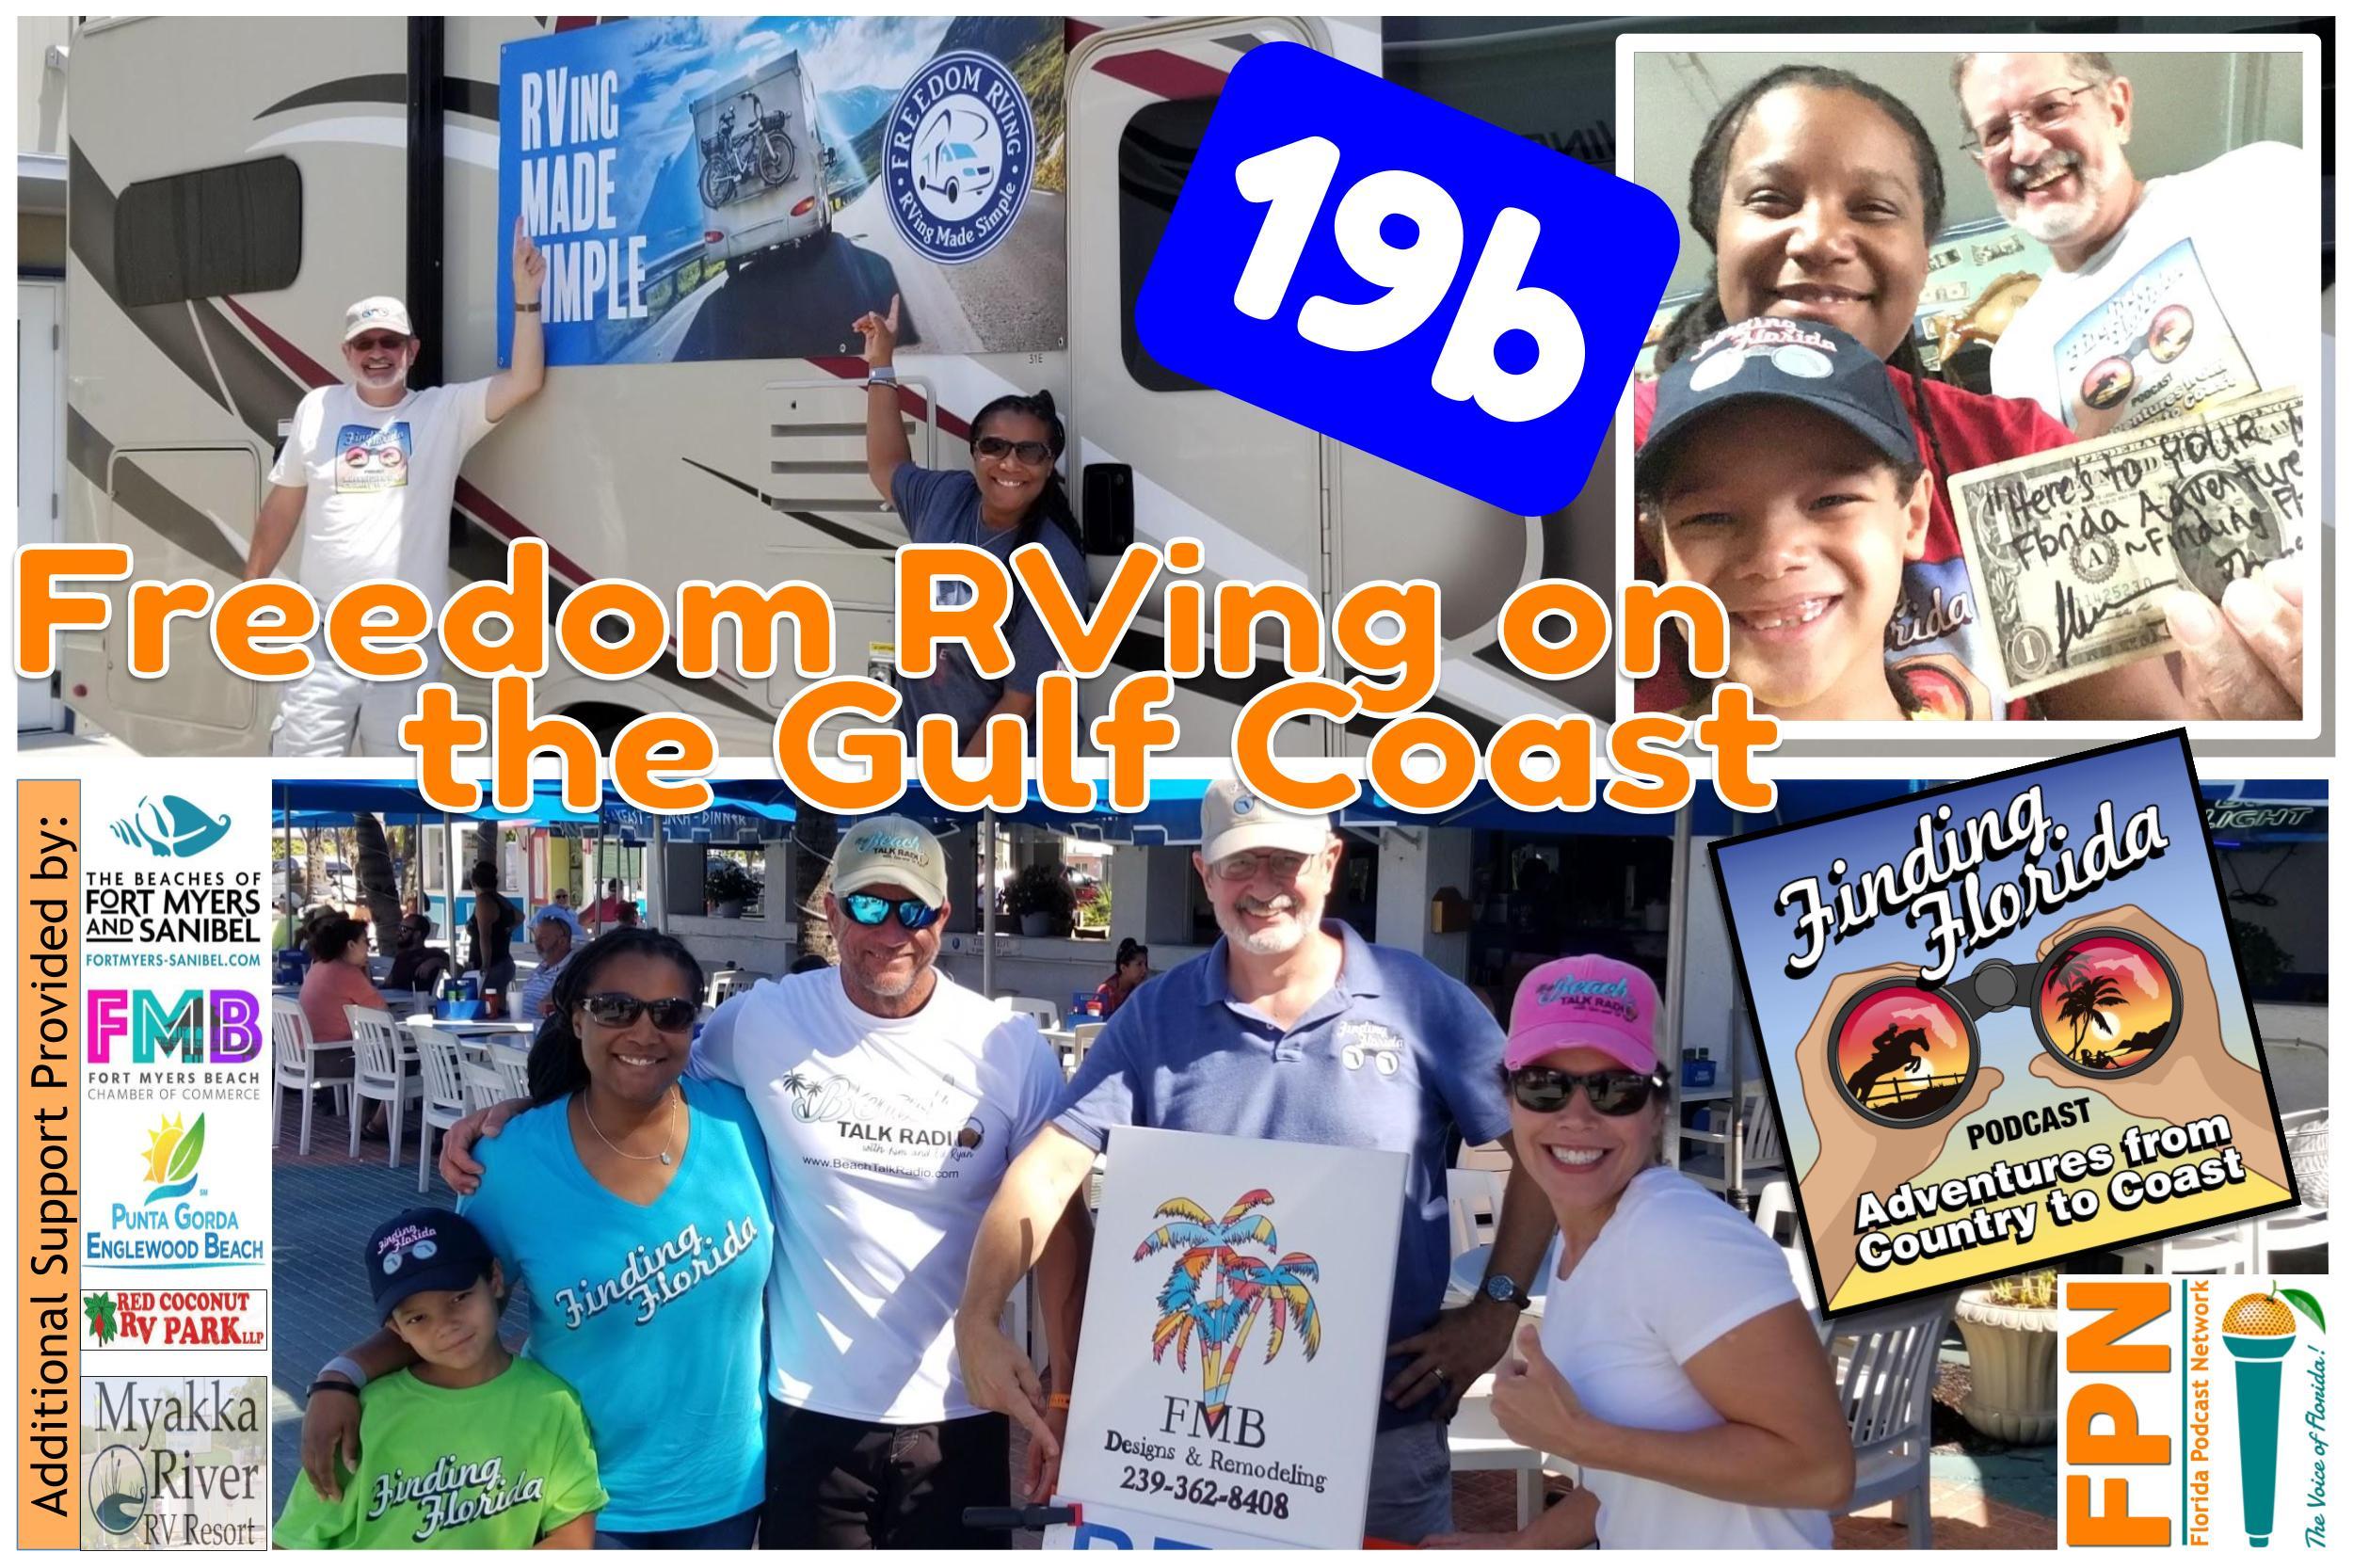 Freedom RVing,Myakka River RV Resort, Peace River Seafood, Beach Talk Radio,Edison and Ford Winter Estates,Red Coconut RV Park